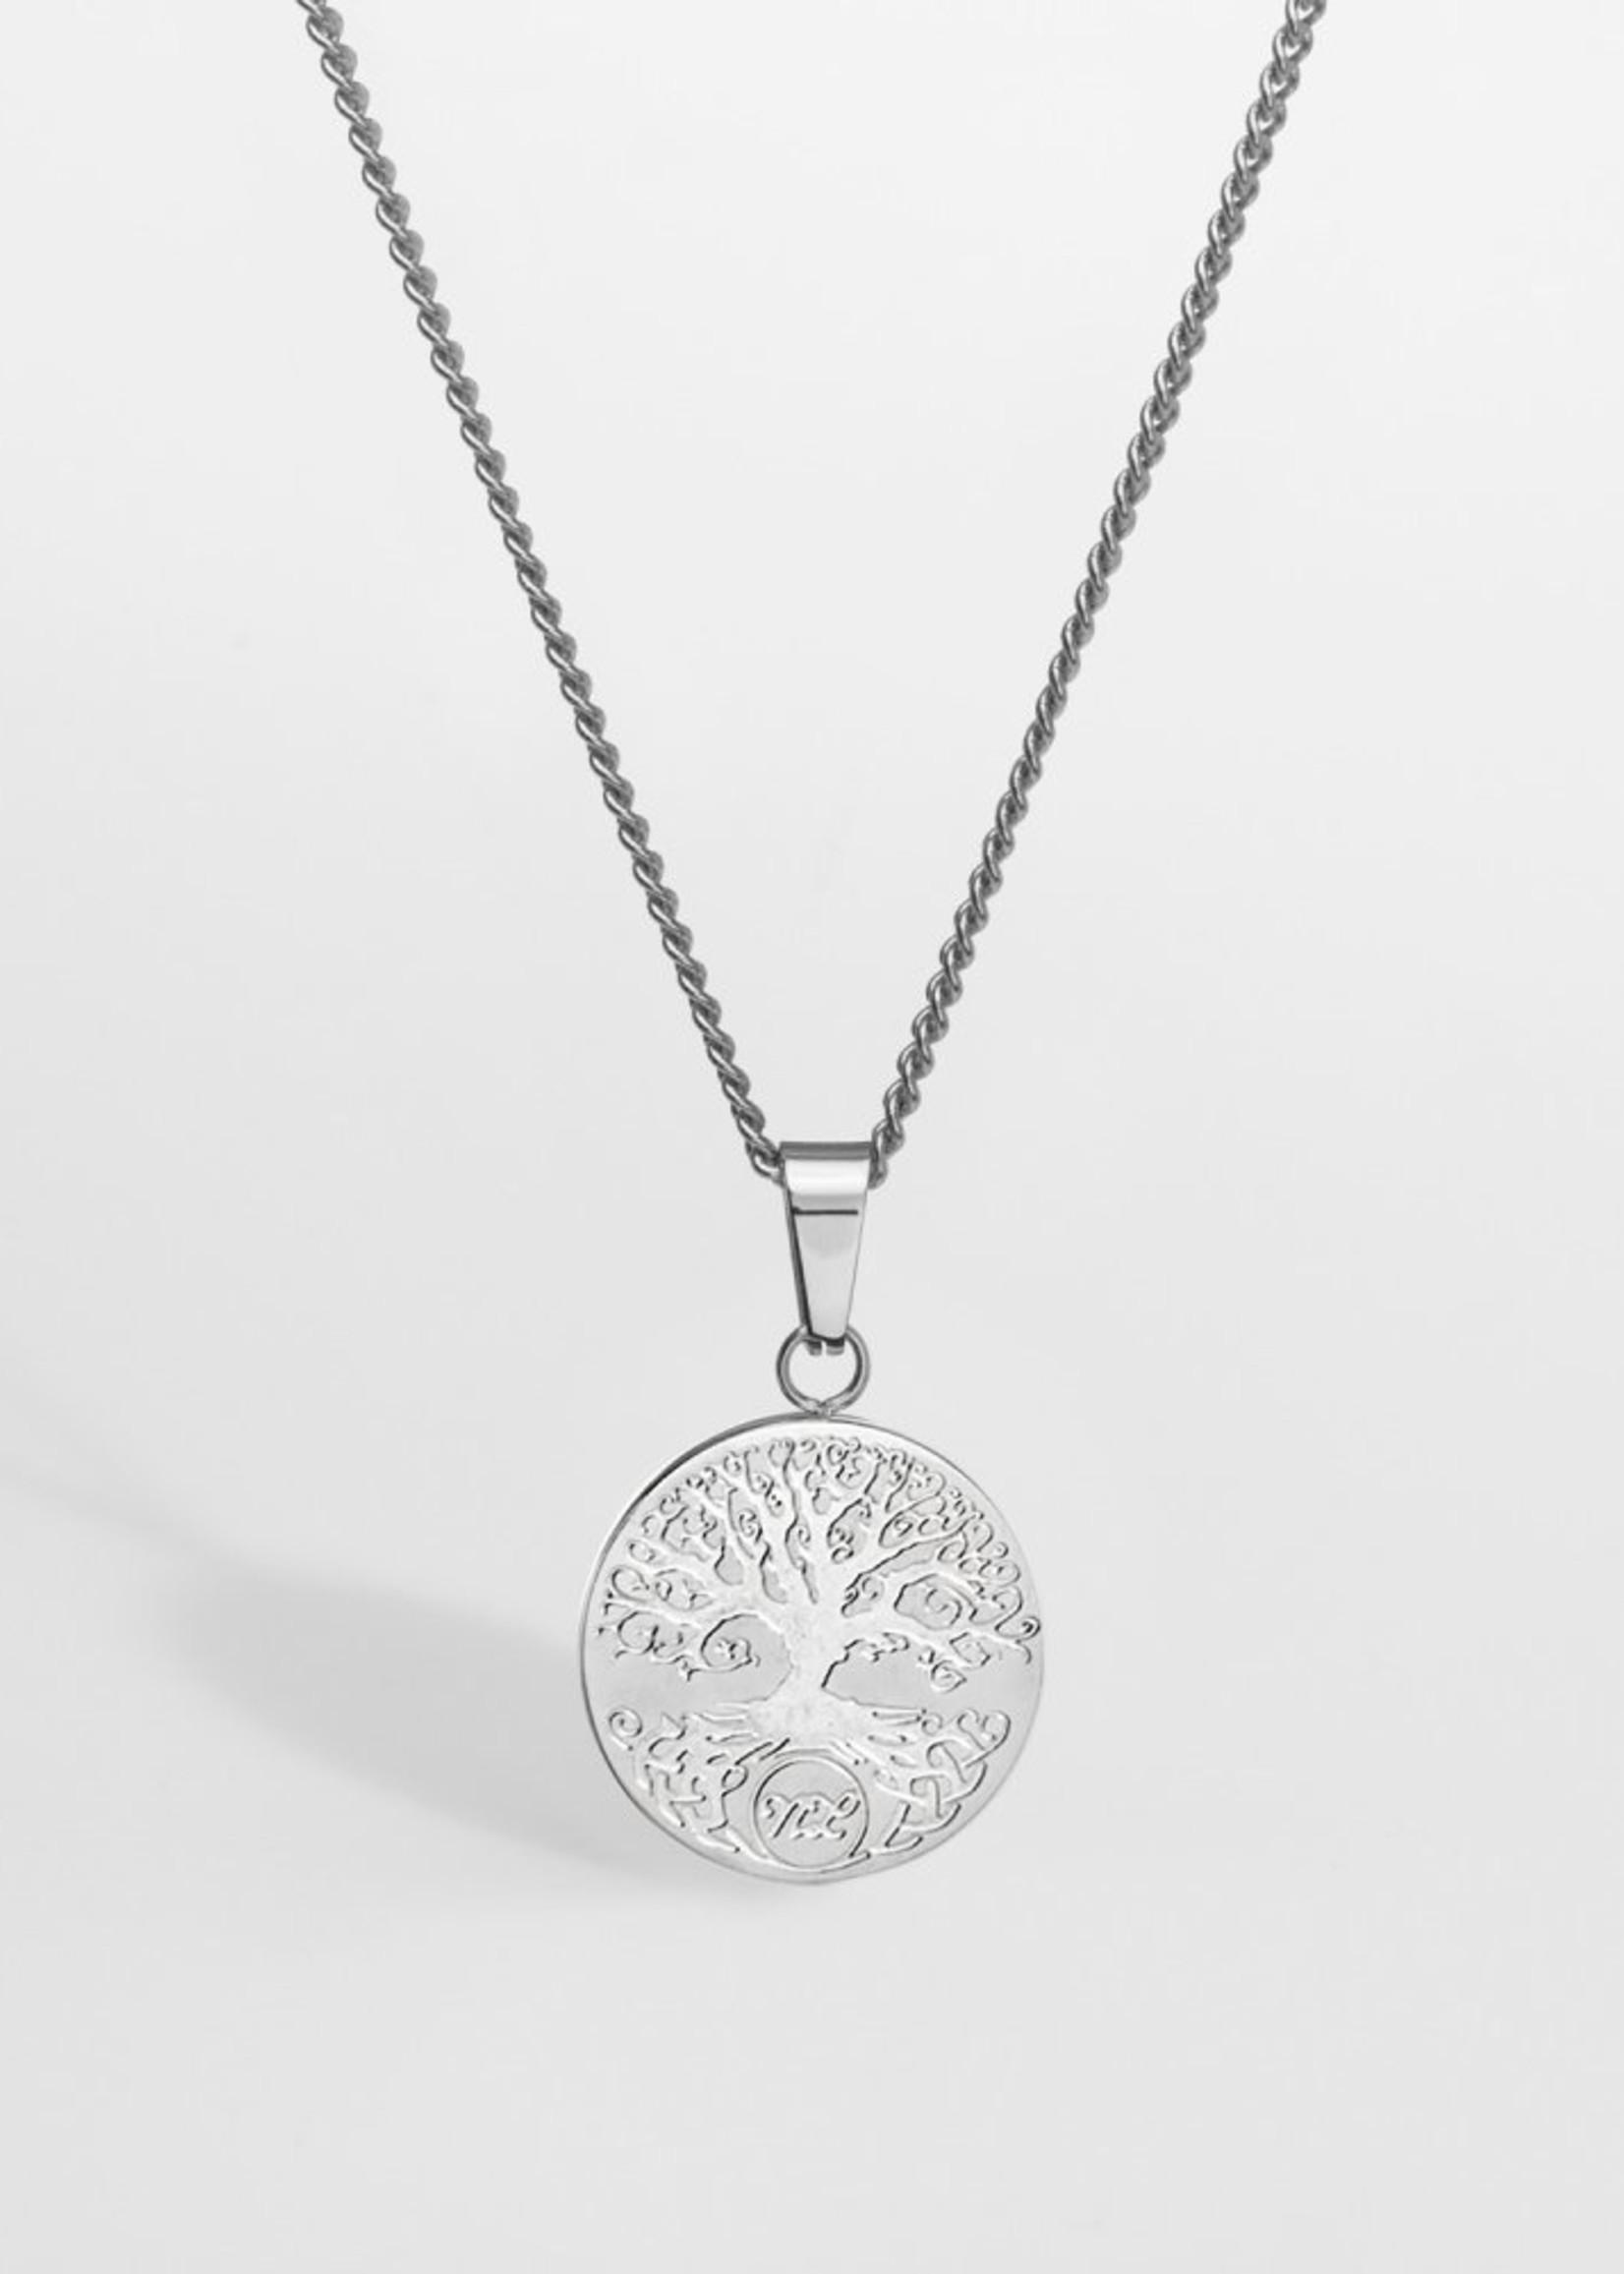 Northern Legacy Nl Yggdrasil pendant - Silver Tone